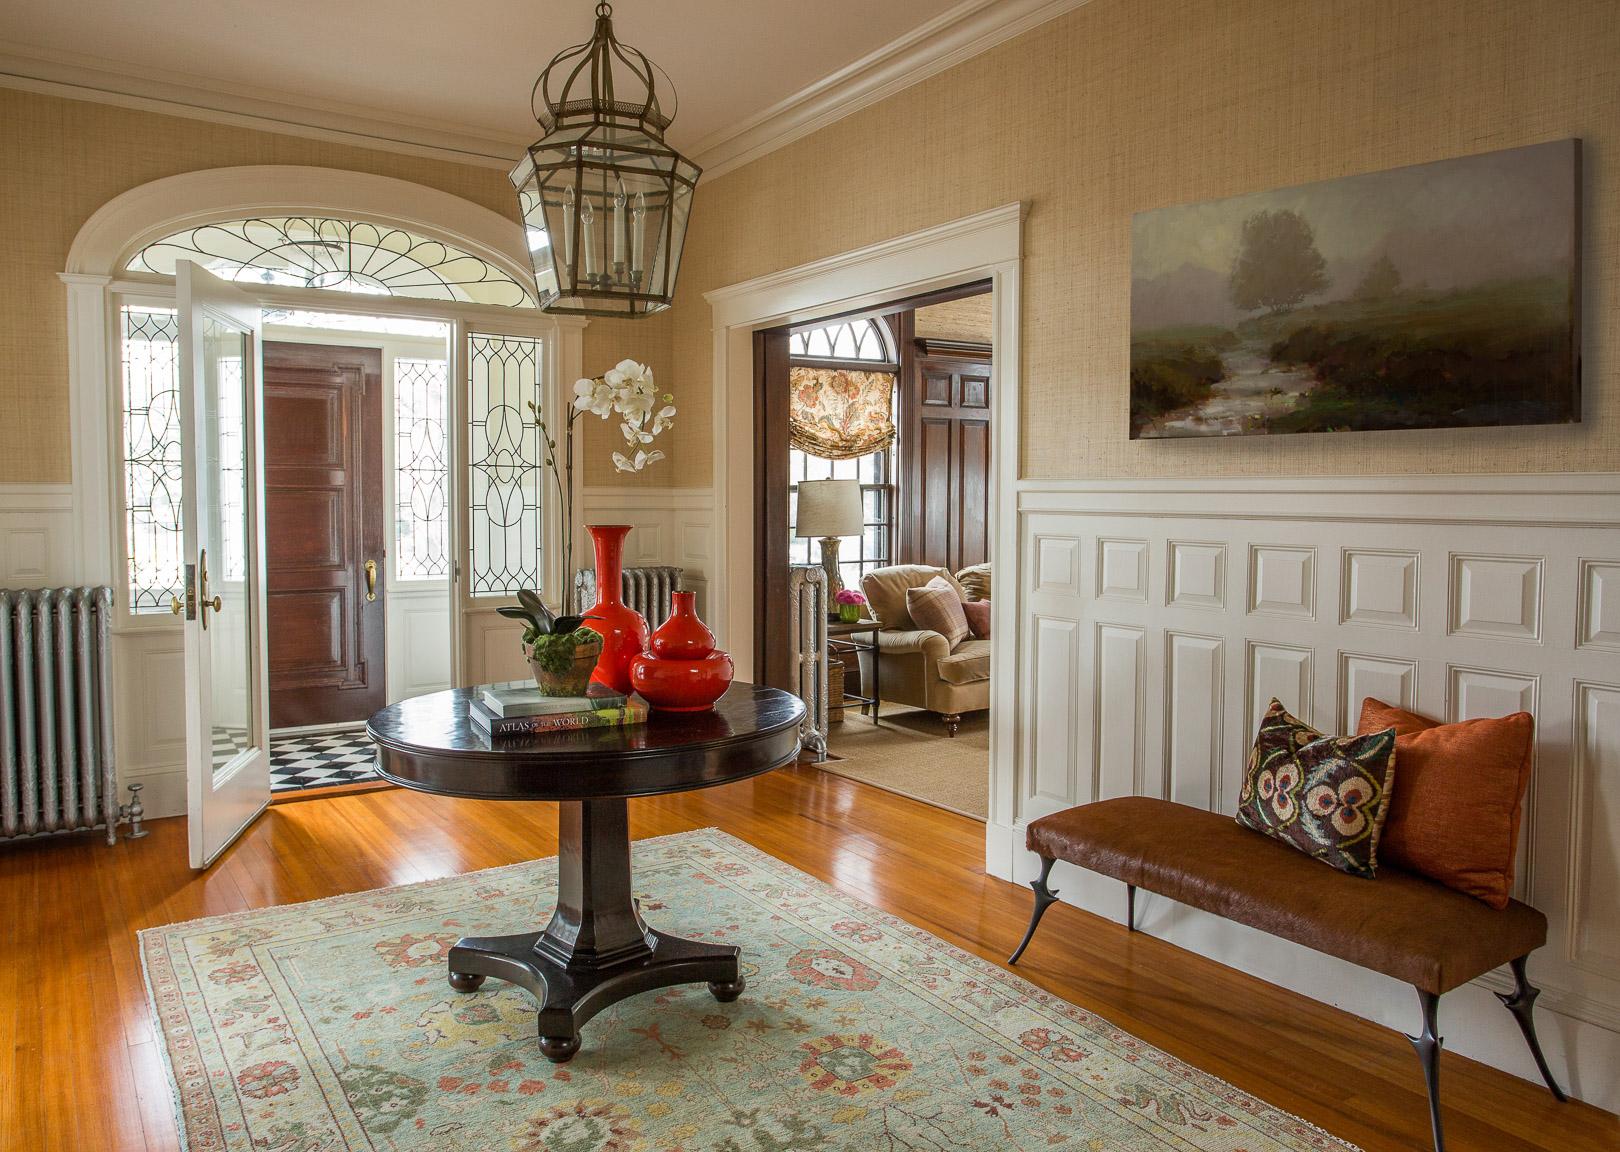 Interior design byTiffany Leblanc of LeBlanc Design, LLC